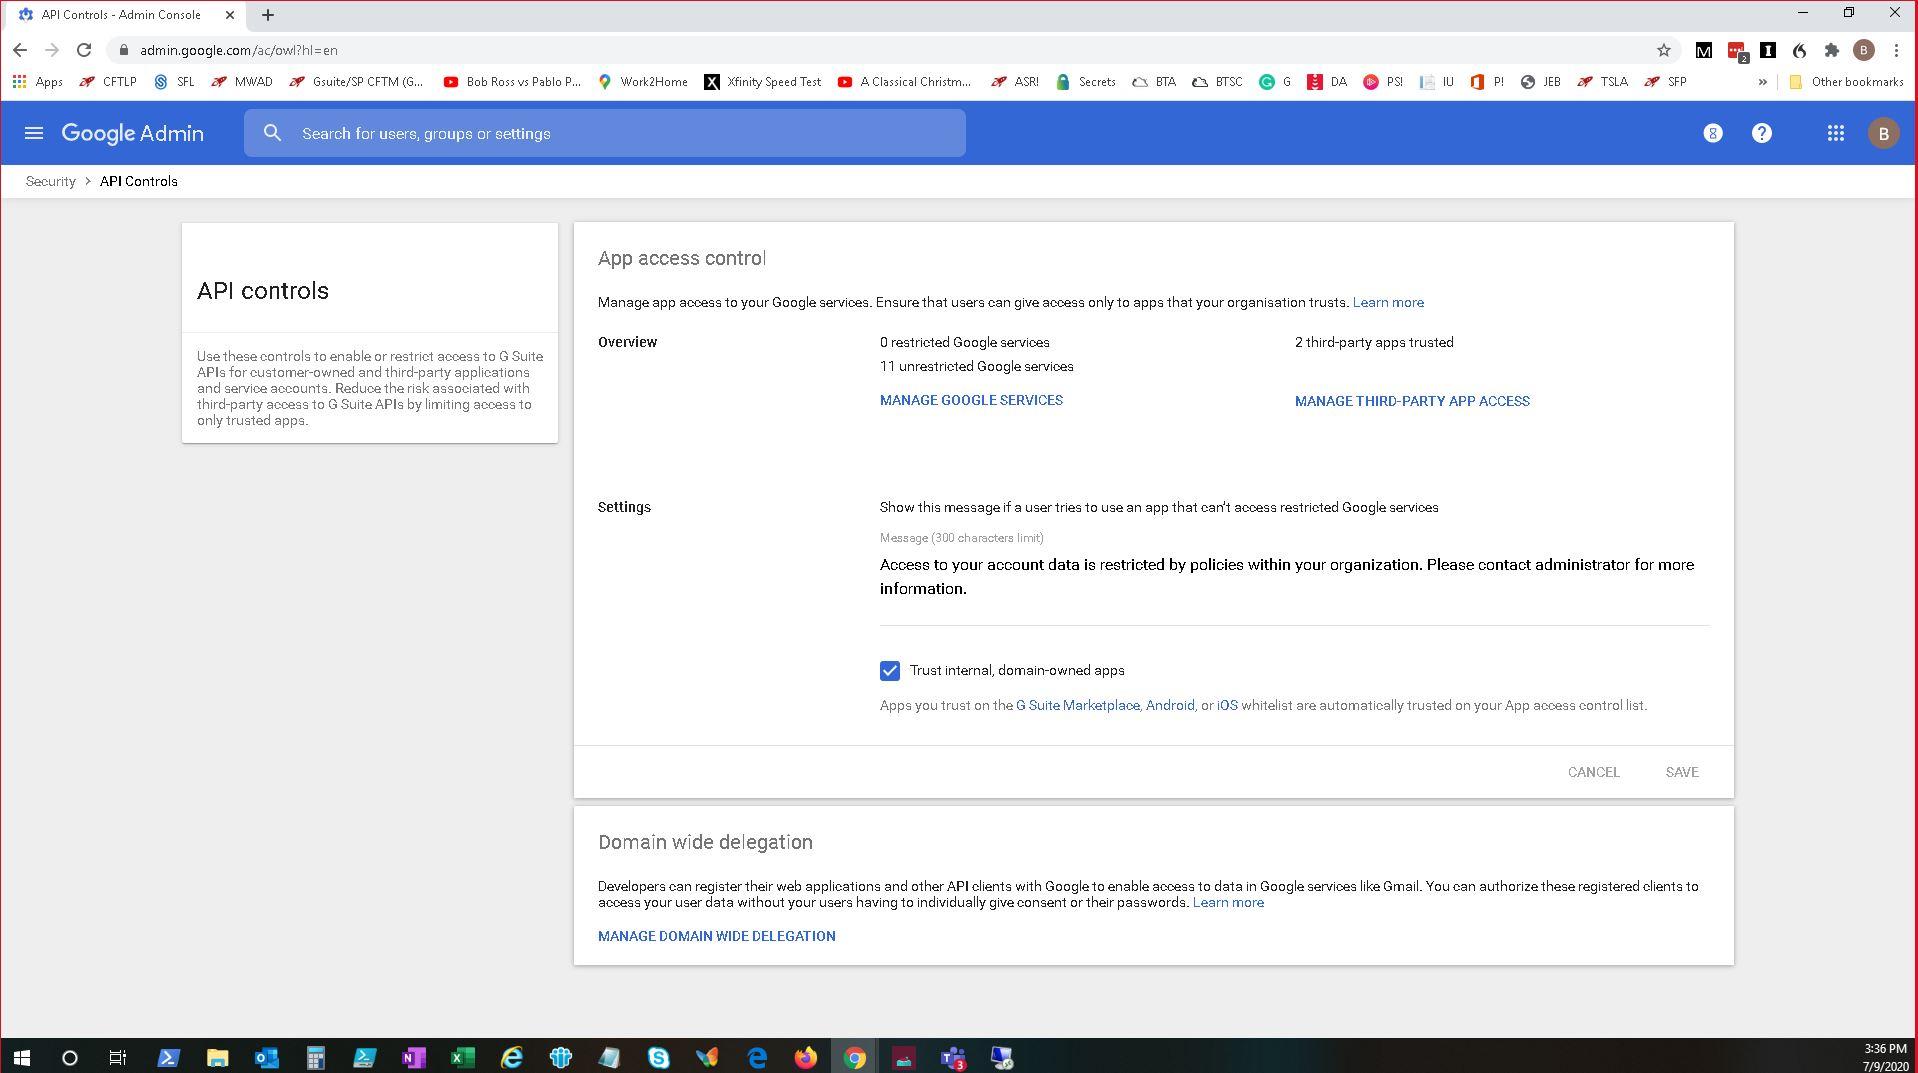 New_Google_Admin_APP_Access_Control.JPG